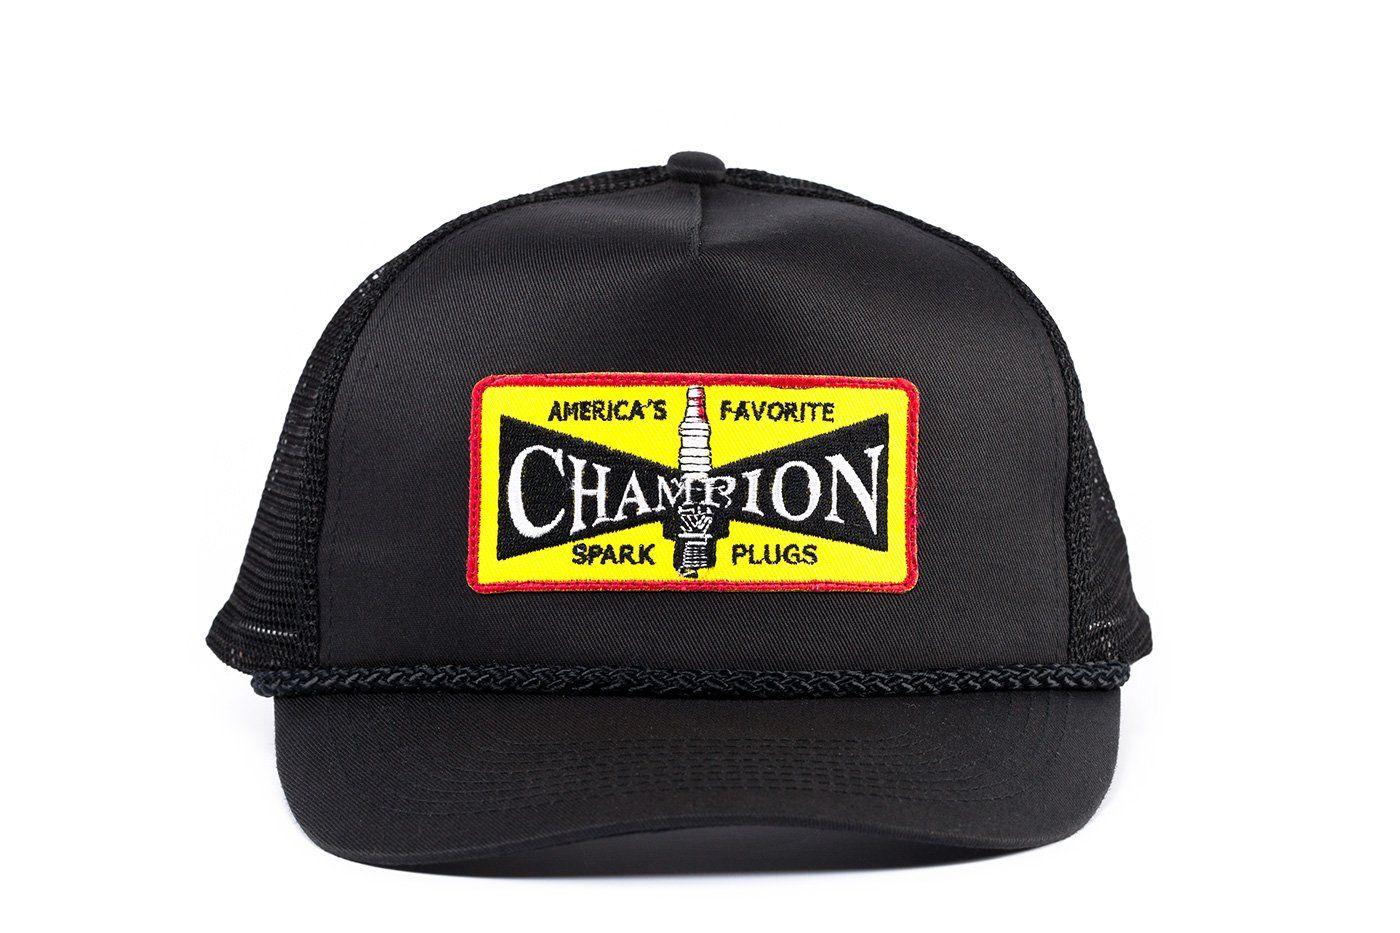 cd82573f2e Vintage Champion Spark Plugs Racing Hat